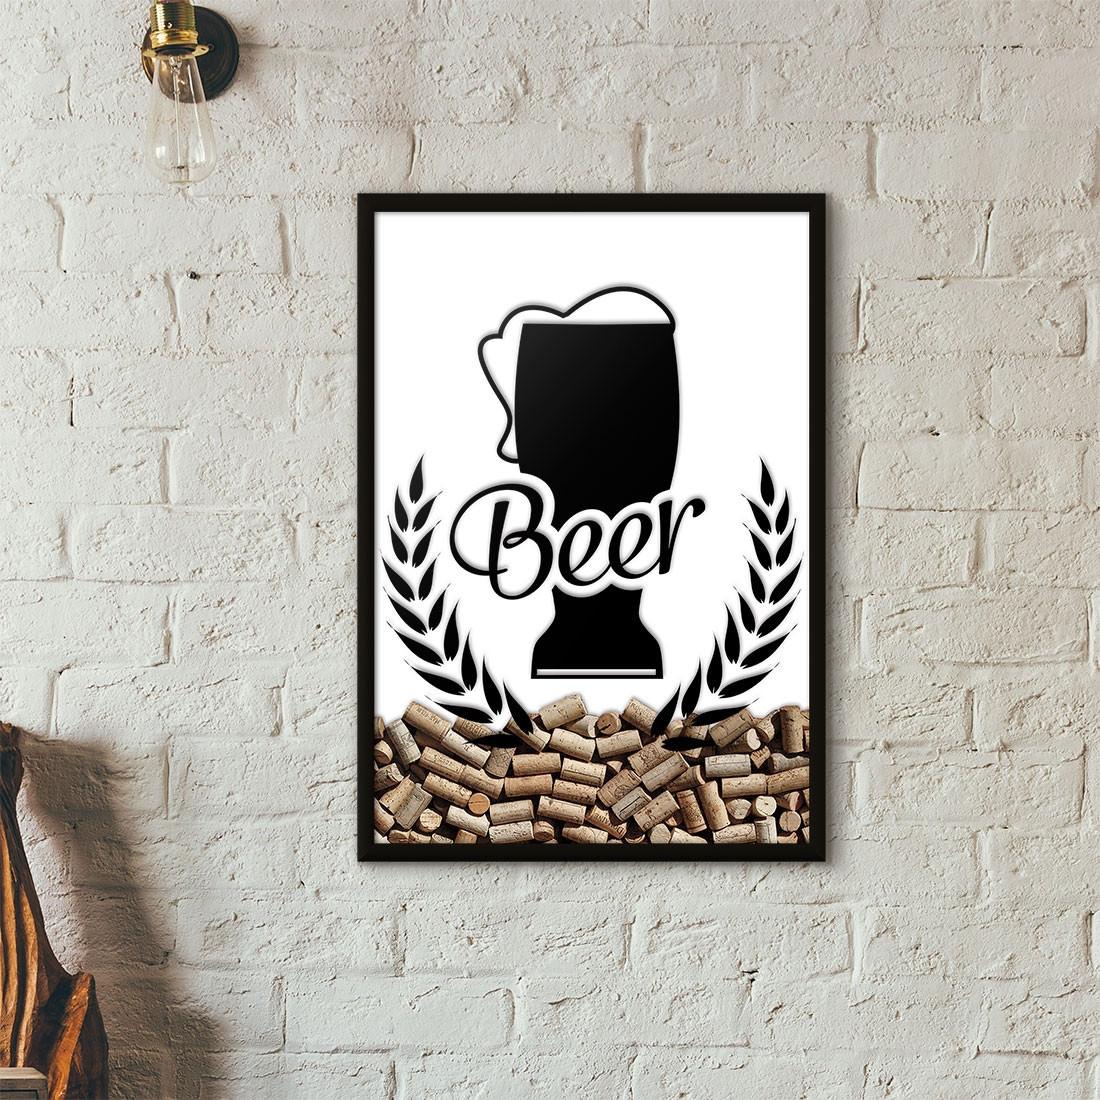 Quadro Porta Tampinhas de Cerveja - Tulipa Beer - Branco